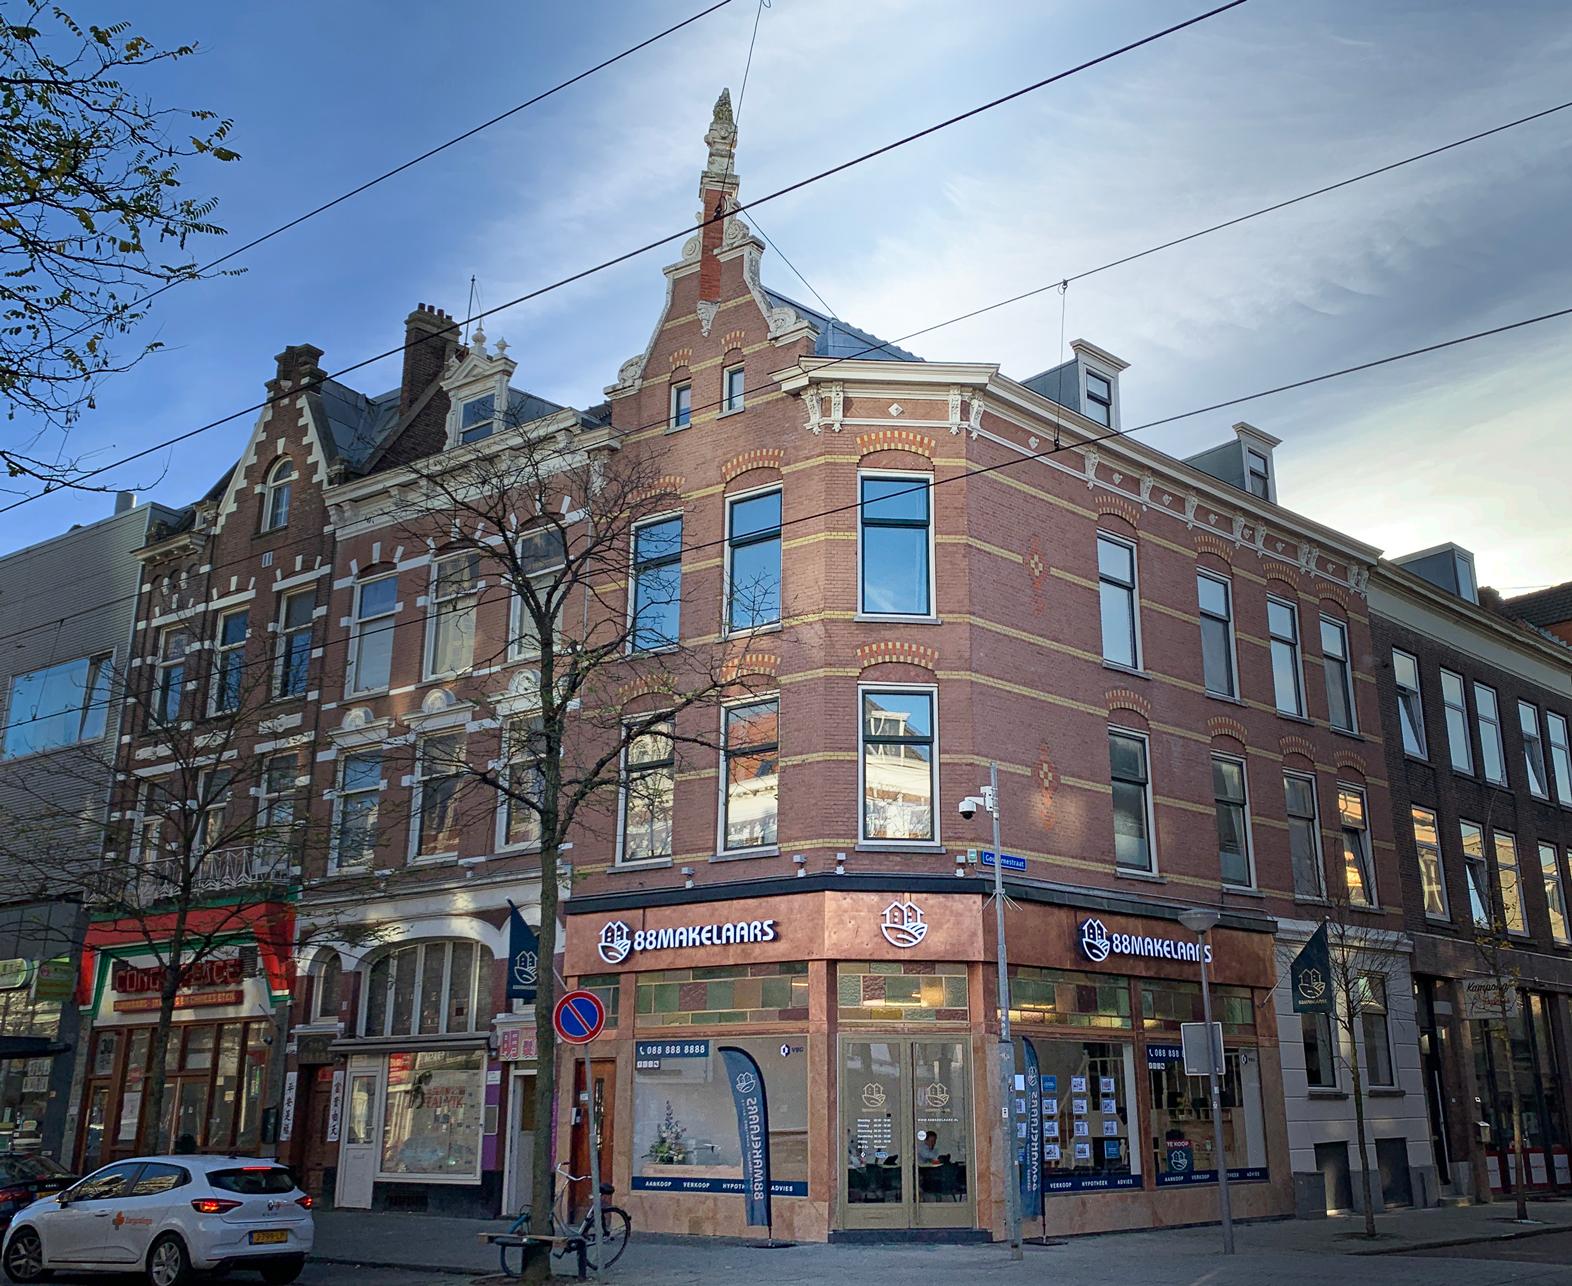 88 Makelaars Rotterdam